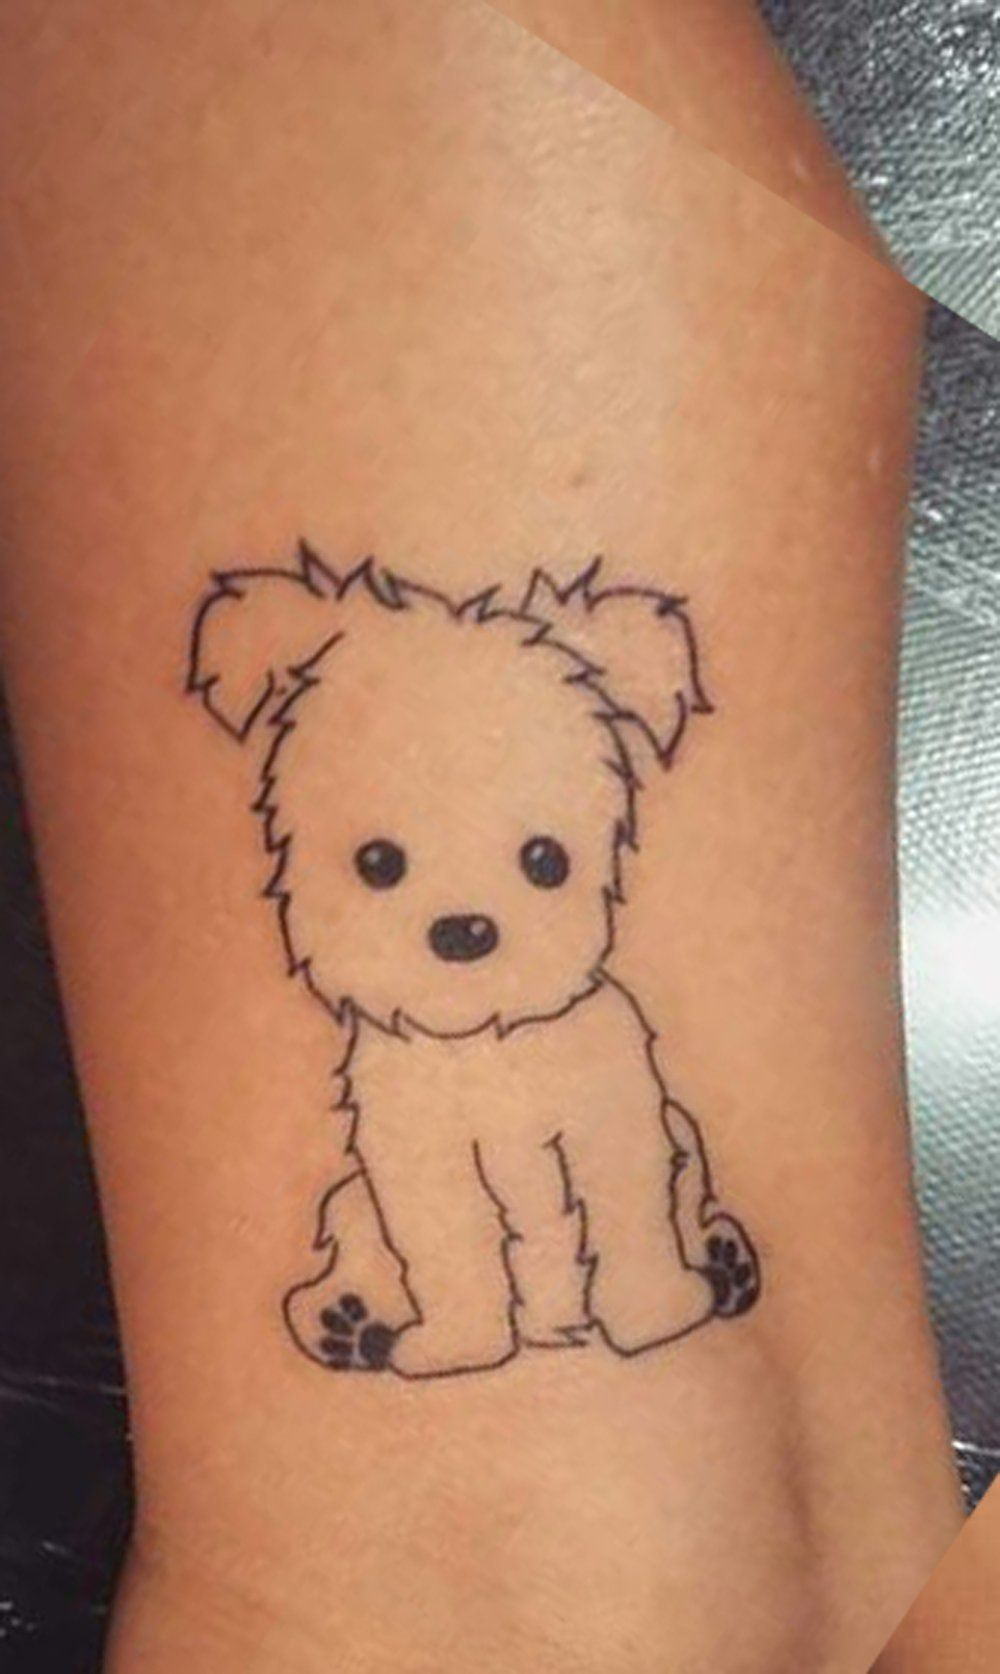 30 Cute Small Simple Dog Tattoo Ideas For Women Animal Lovers Cute Small Dog Tattoo Ideas Arm Sleeve For Women Ide Small Dog Tattoos Dog Tattoos Animal Tattoos